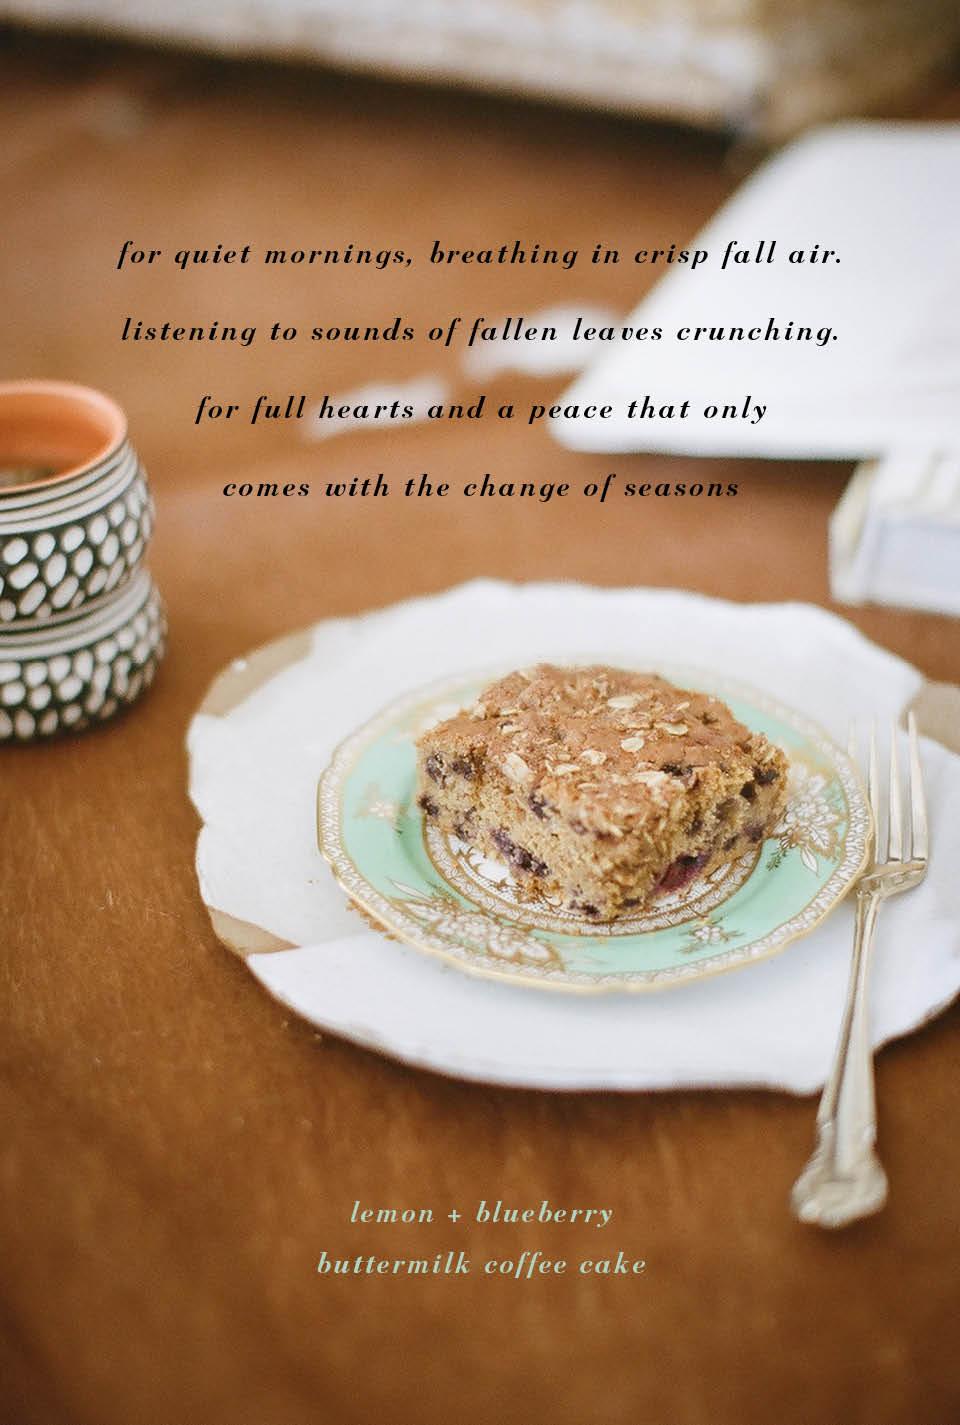 66 Recipe_Lemon Blueberry coffee cake.jpg